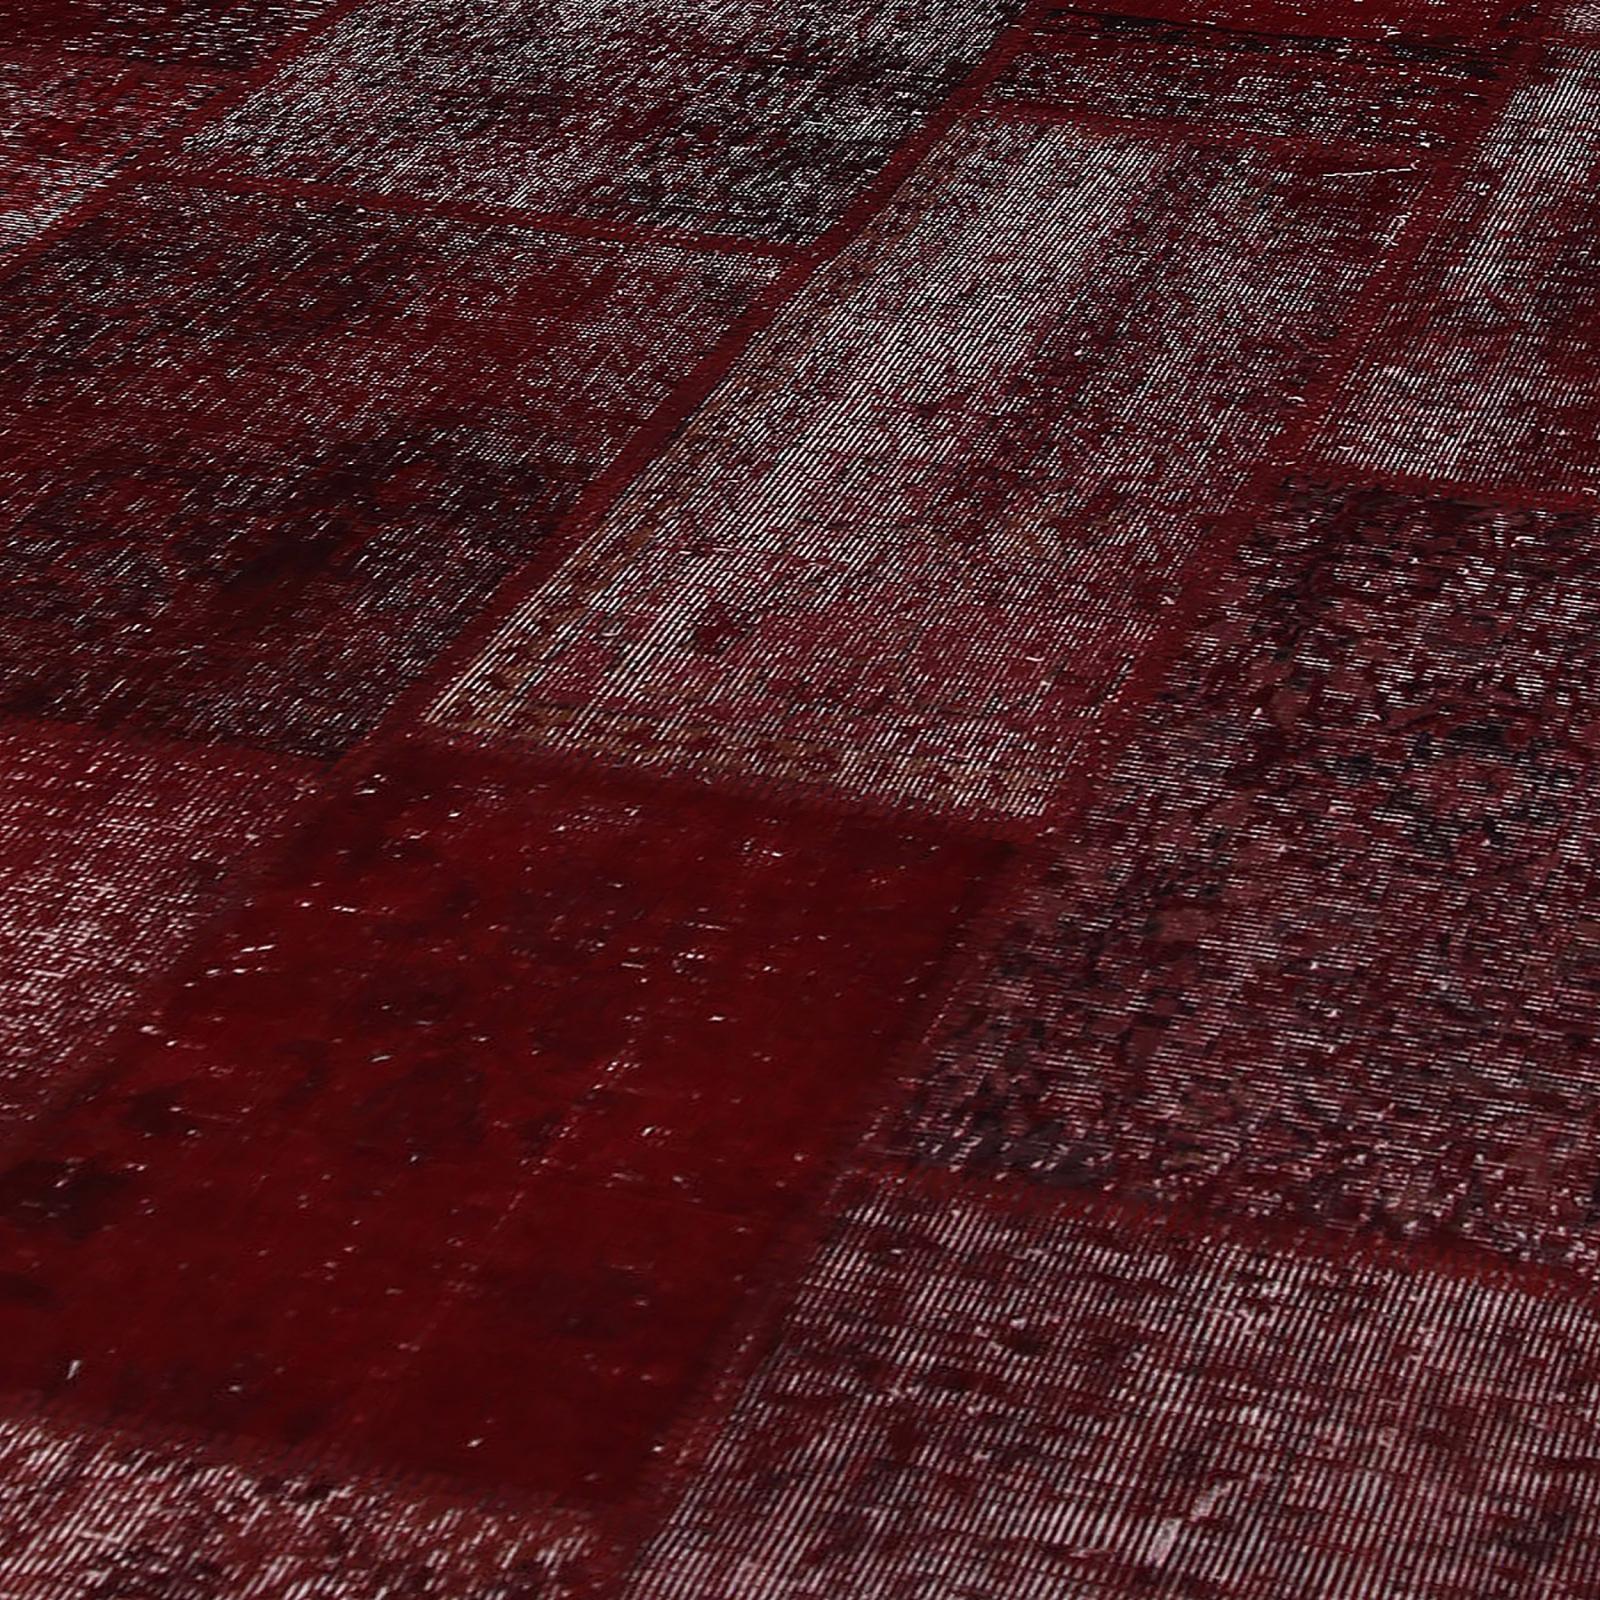 Bordeaux rot vintage patchwork flicken teppich (304x410cm)